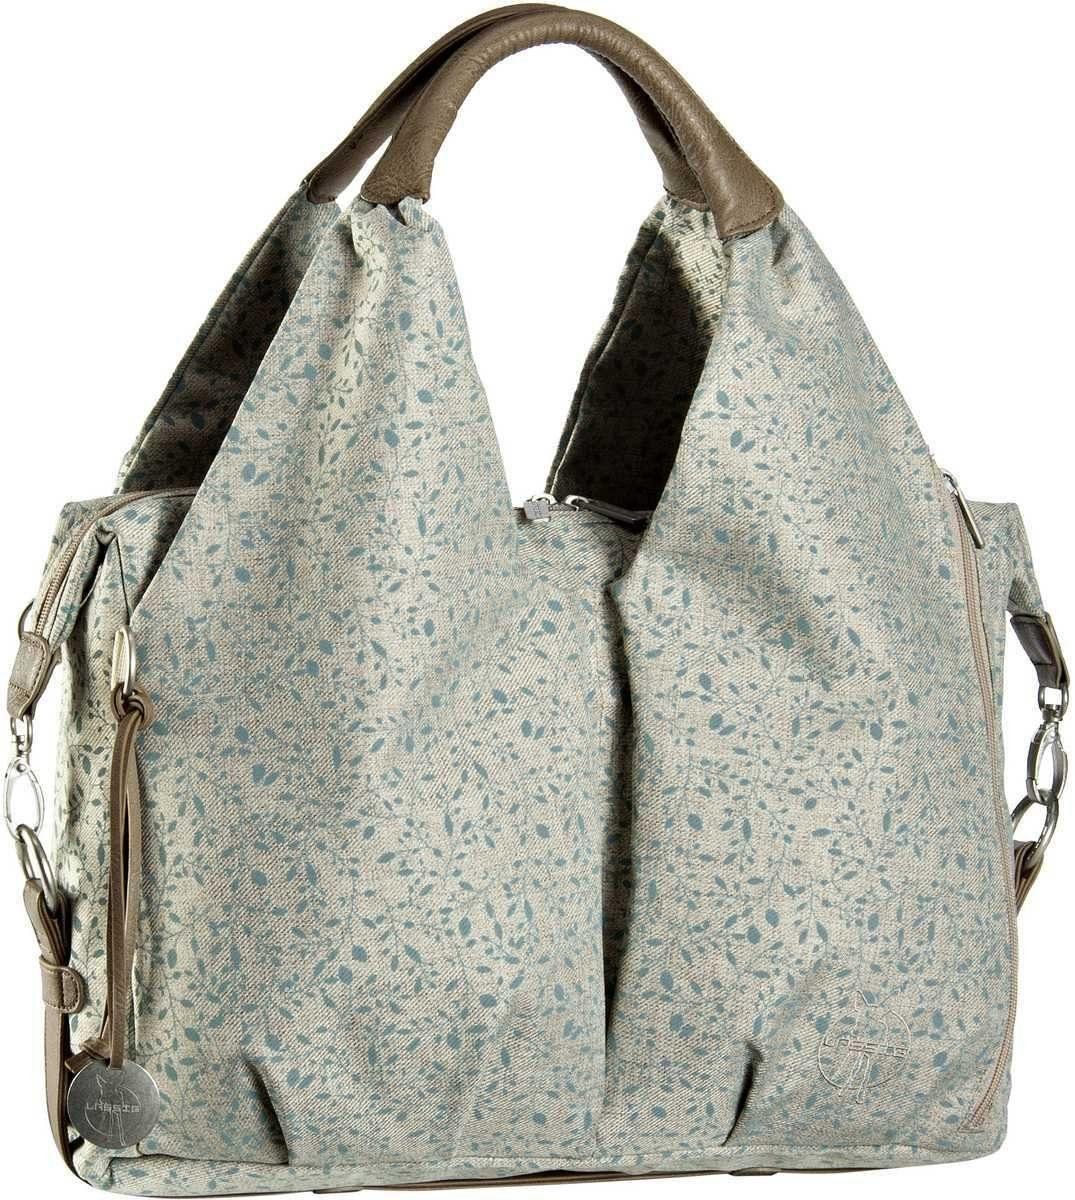 Lässig Neckline Bag Allover Fleur